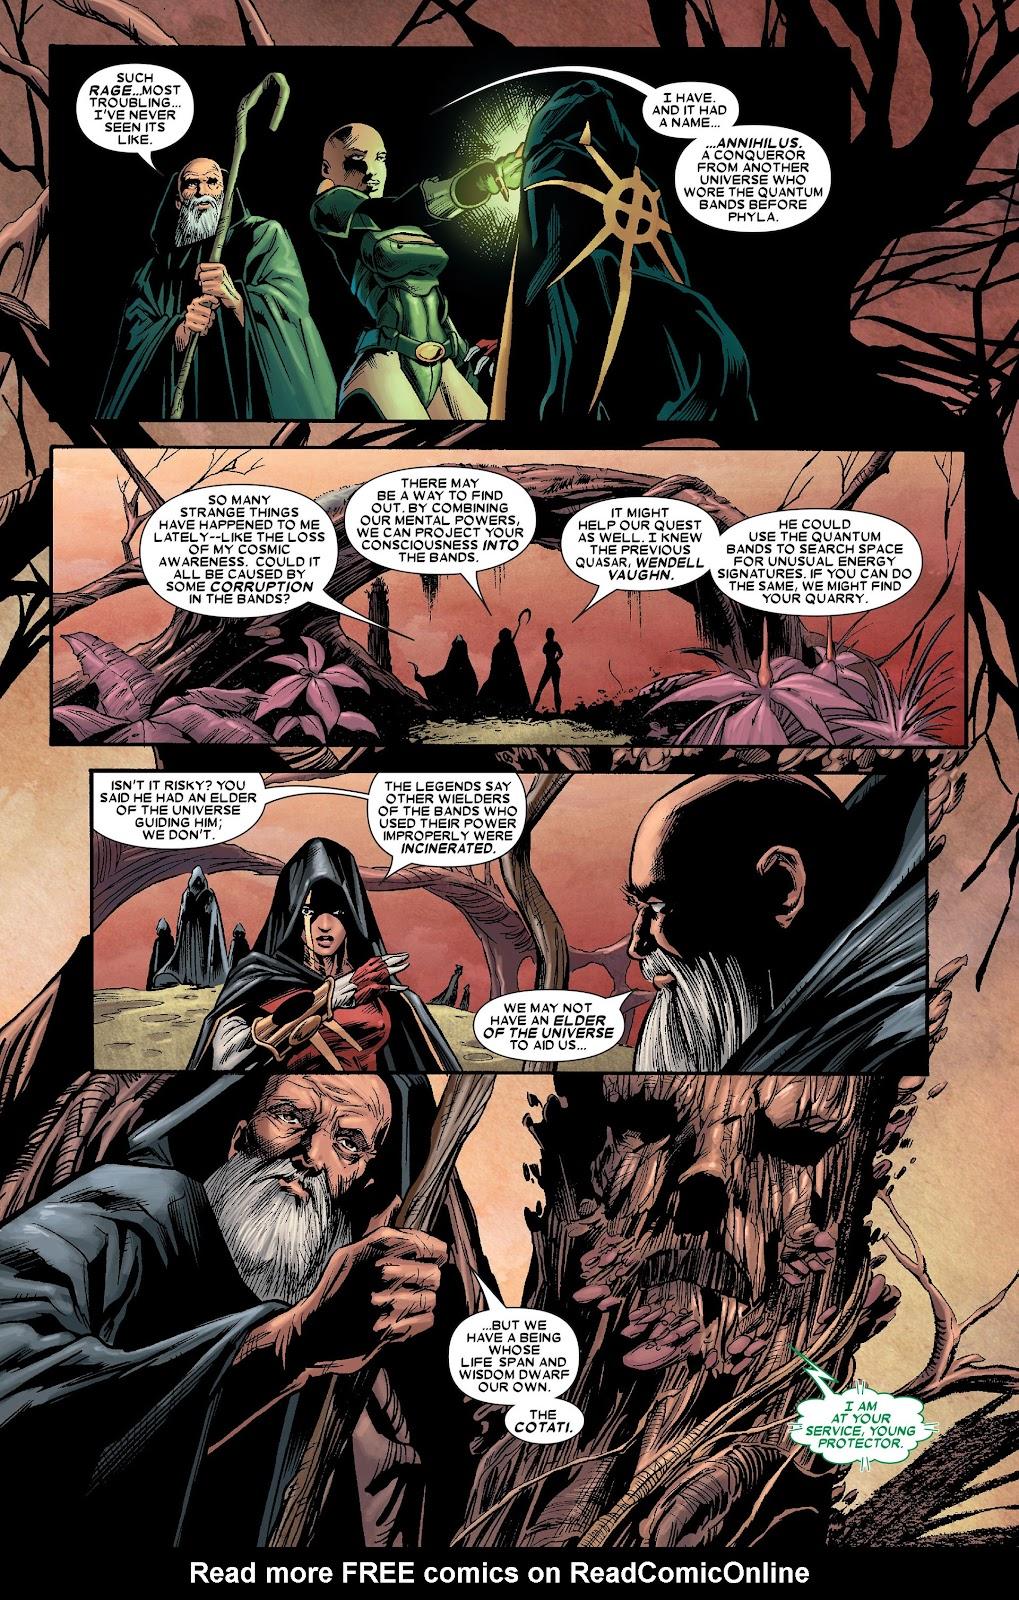 Annihilation: Conquest - Quasar issue 1 - Page 15